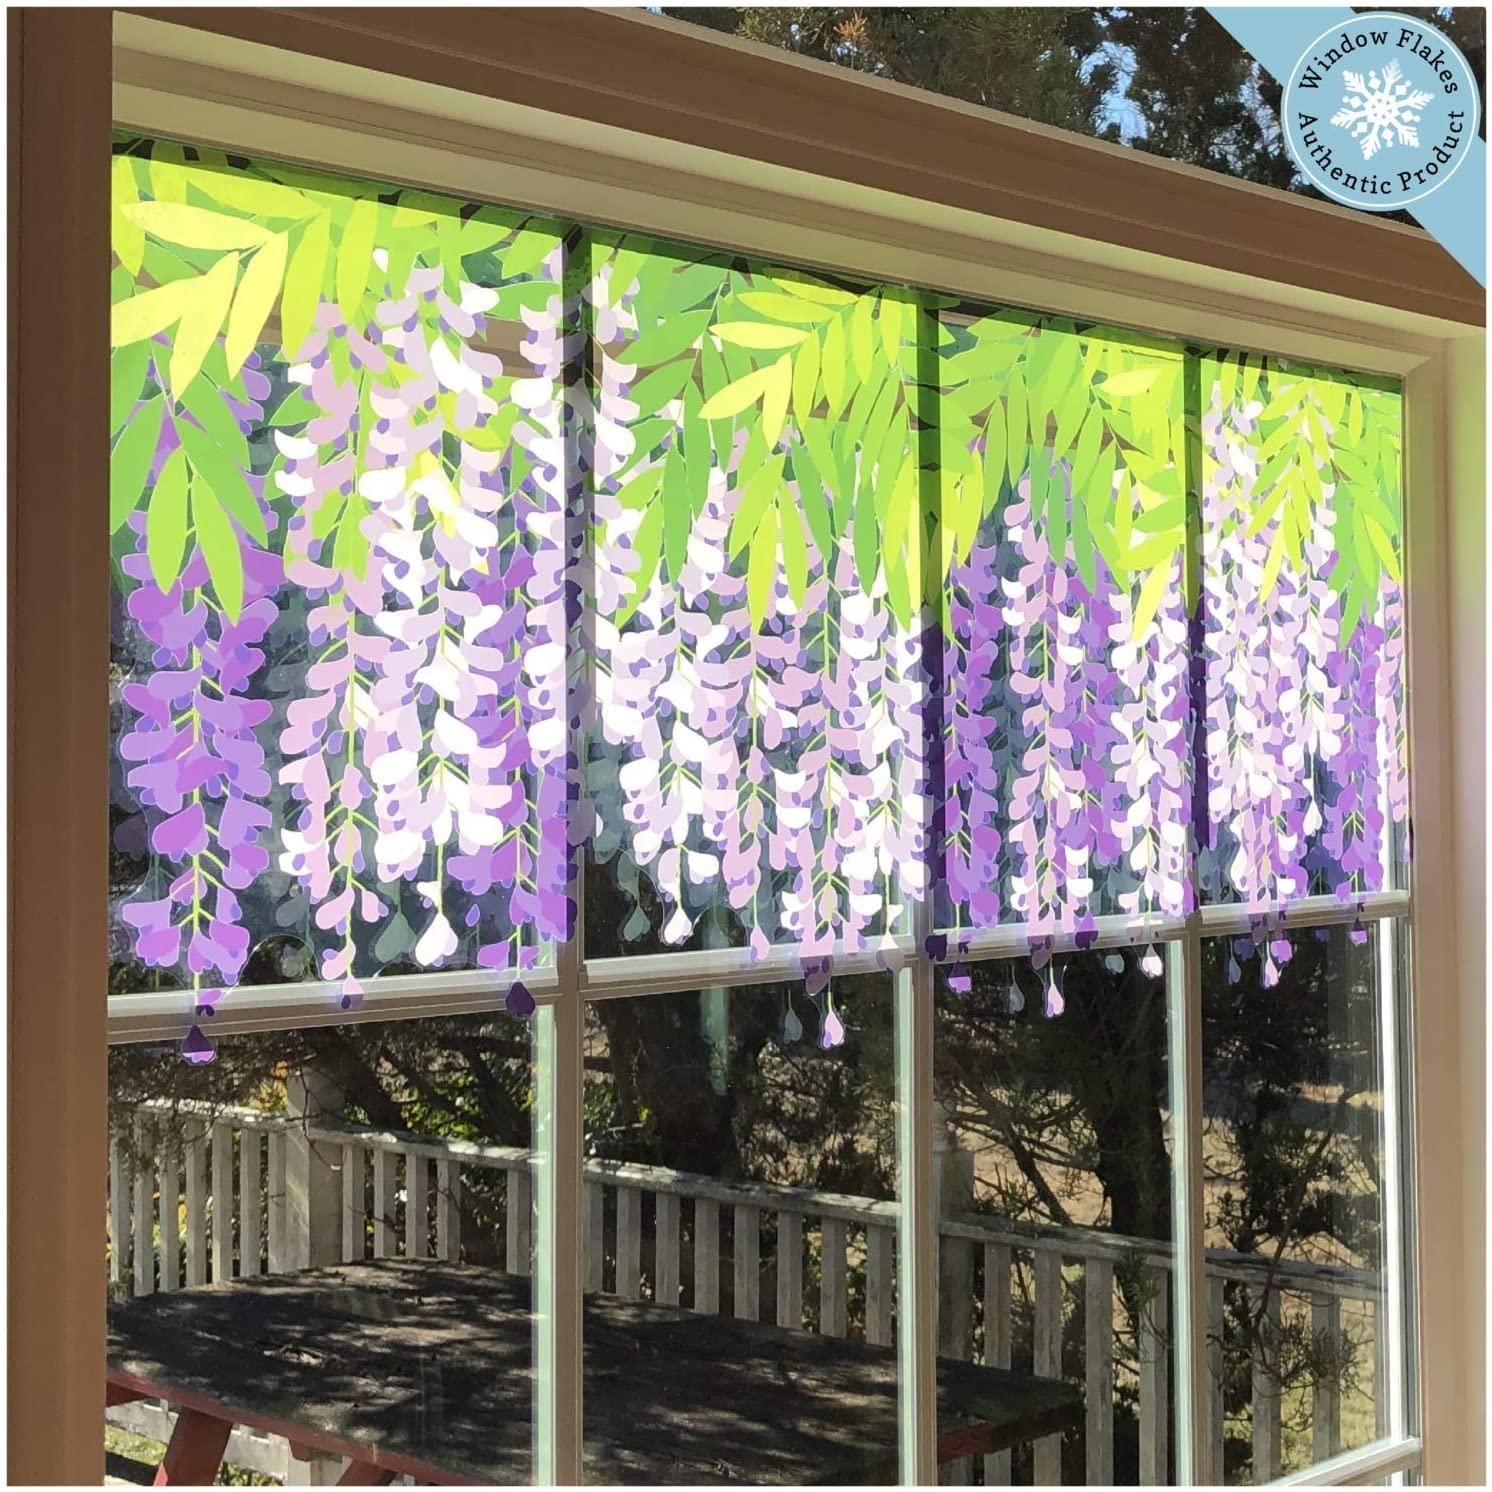 Flower Window Clings - Purple Hanging Wisteria Window Decals Border - Adhesive Free Spring Decorations Window Stickers - Reusable Glass Door Sticker Decals